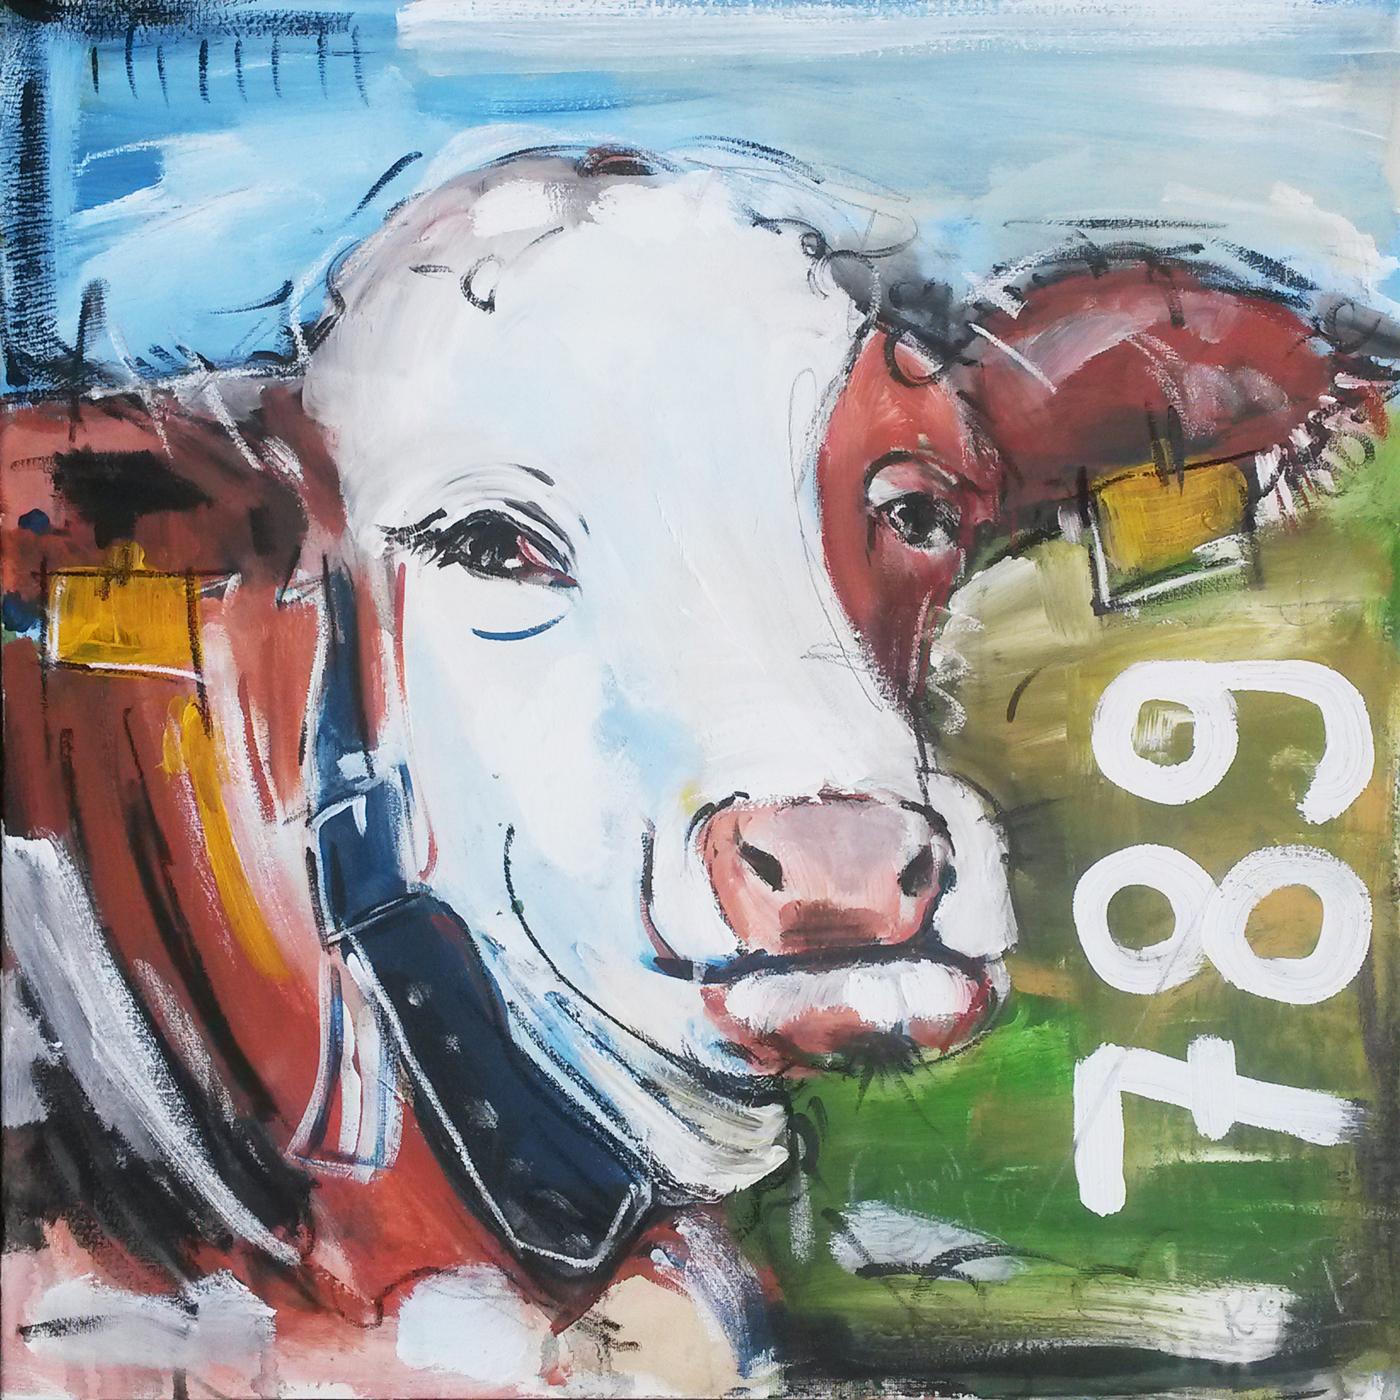 Kunstdruck kuh 789 atelier stefanie rogge - Kuh bilder auf leinwand ...